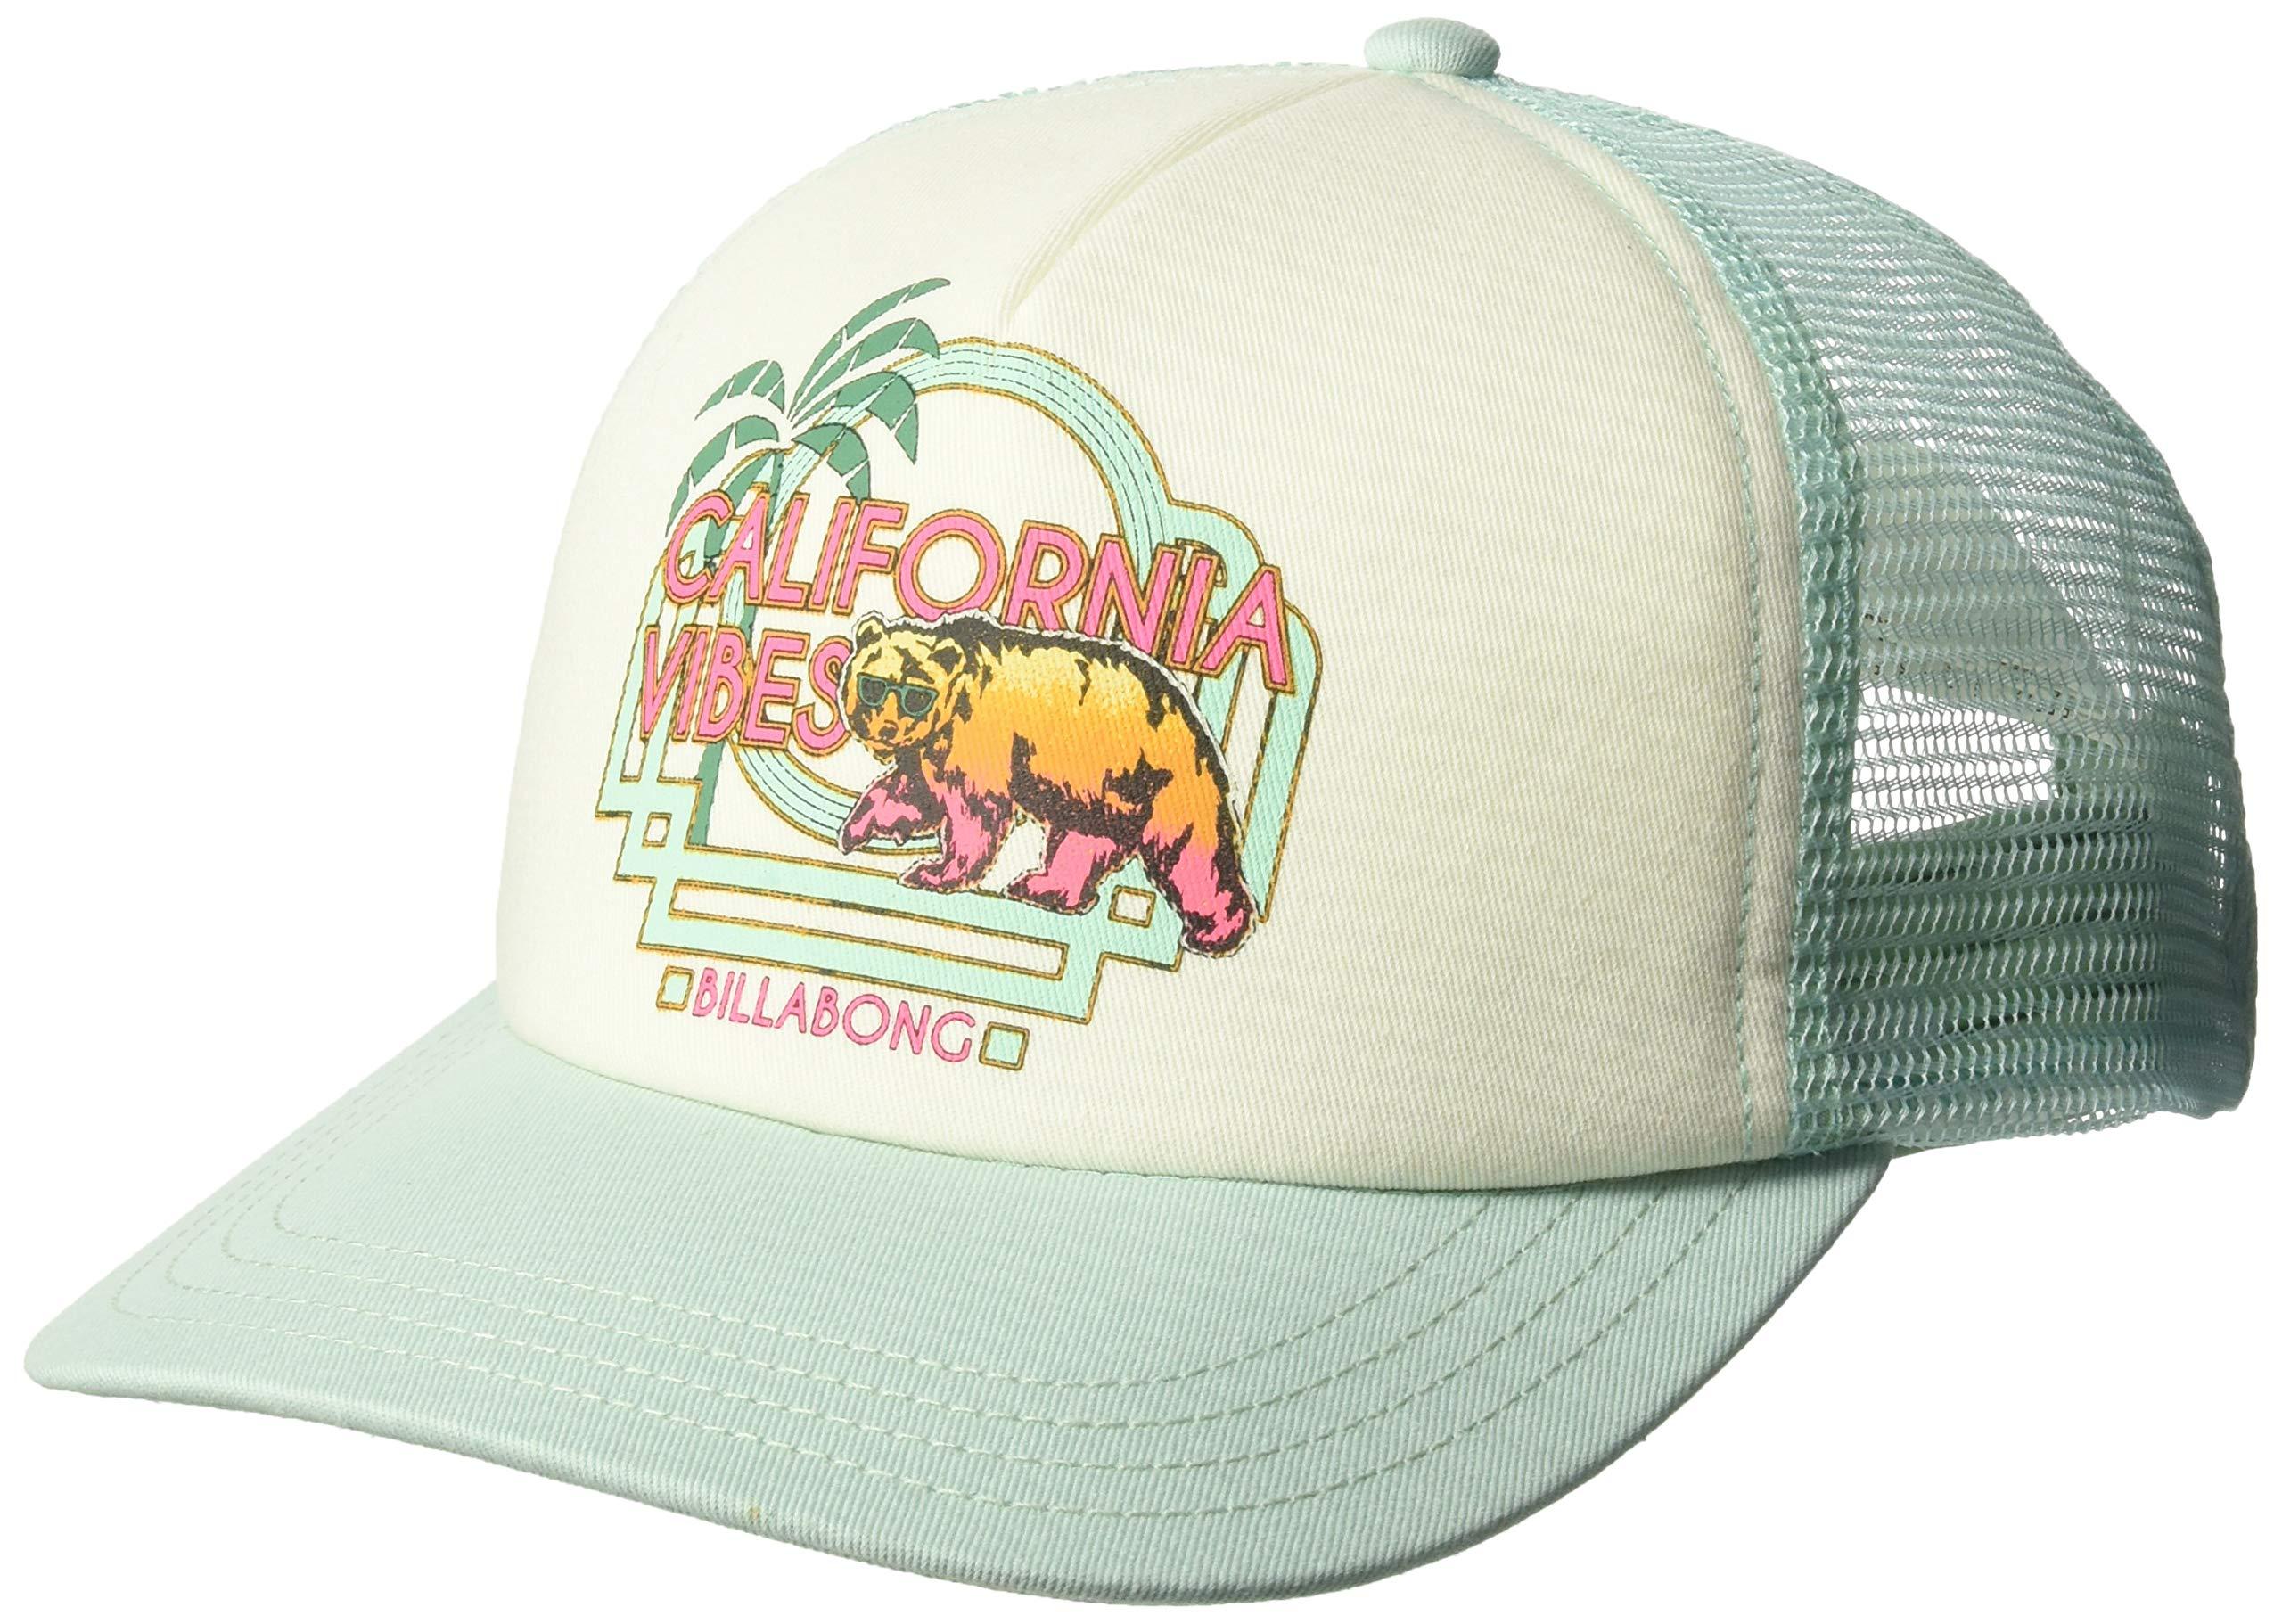 Billabong Girls' Big Cali Vibes Hat, Beach Glass, ONE by Billabong (Image #1)